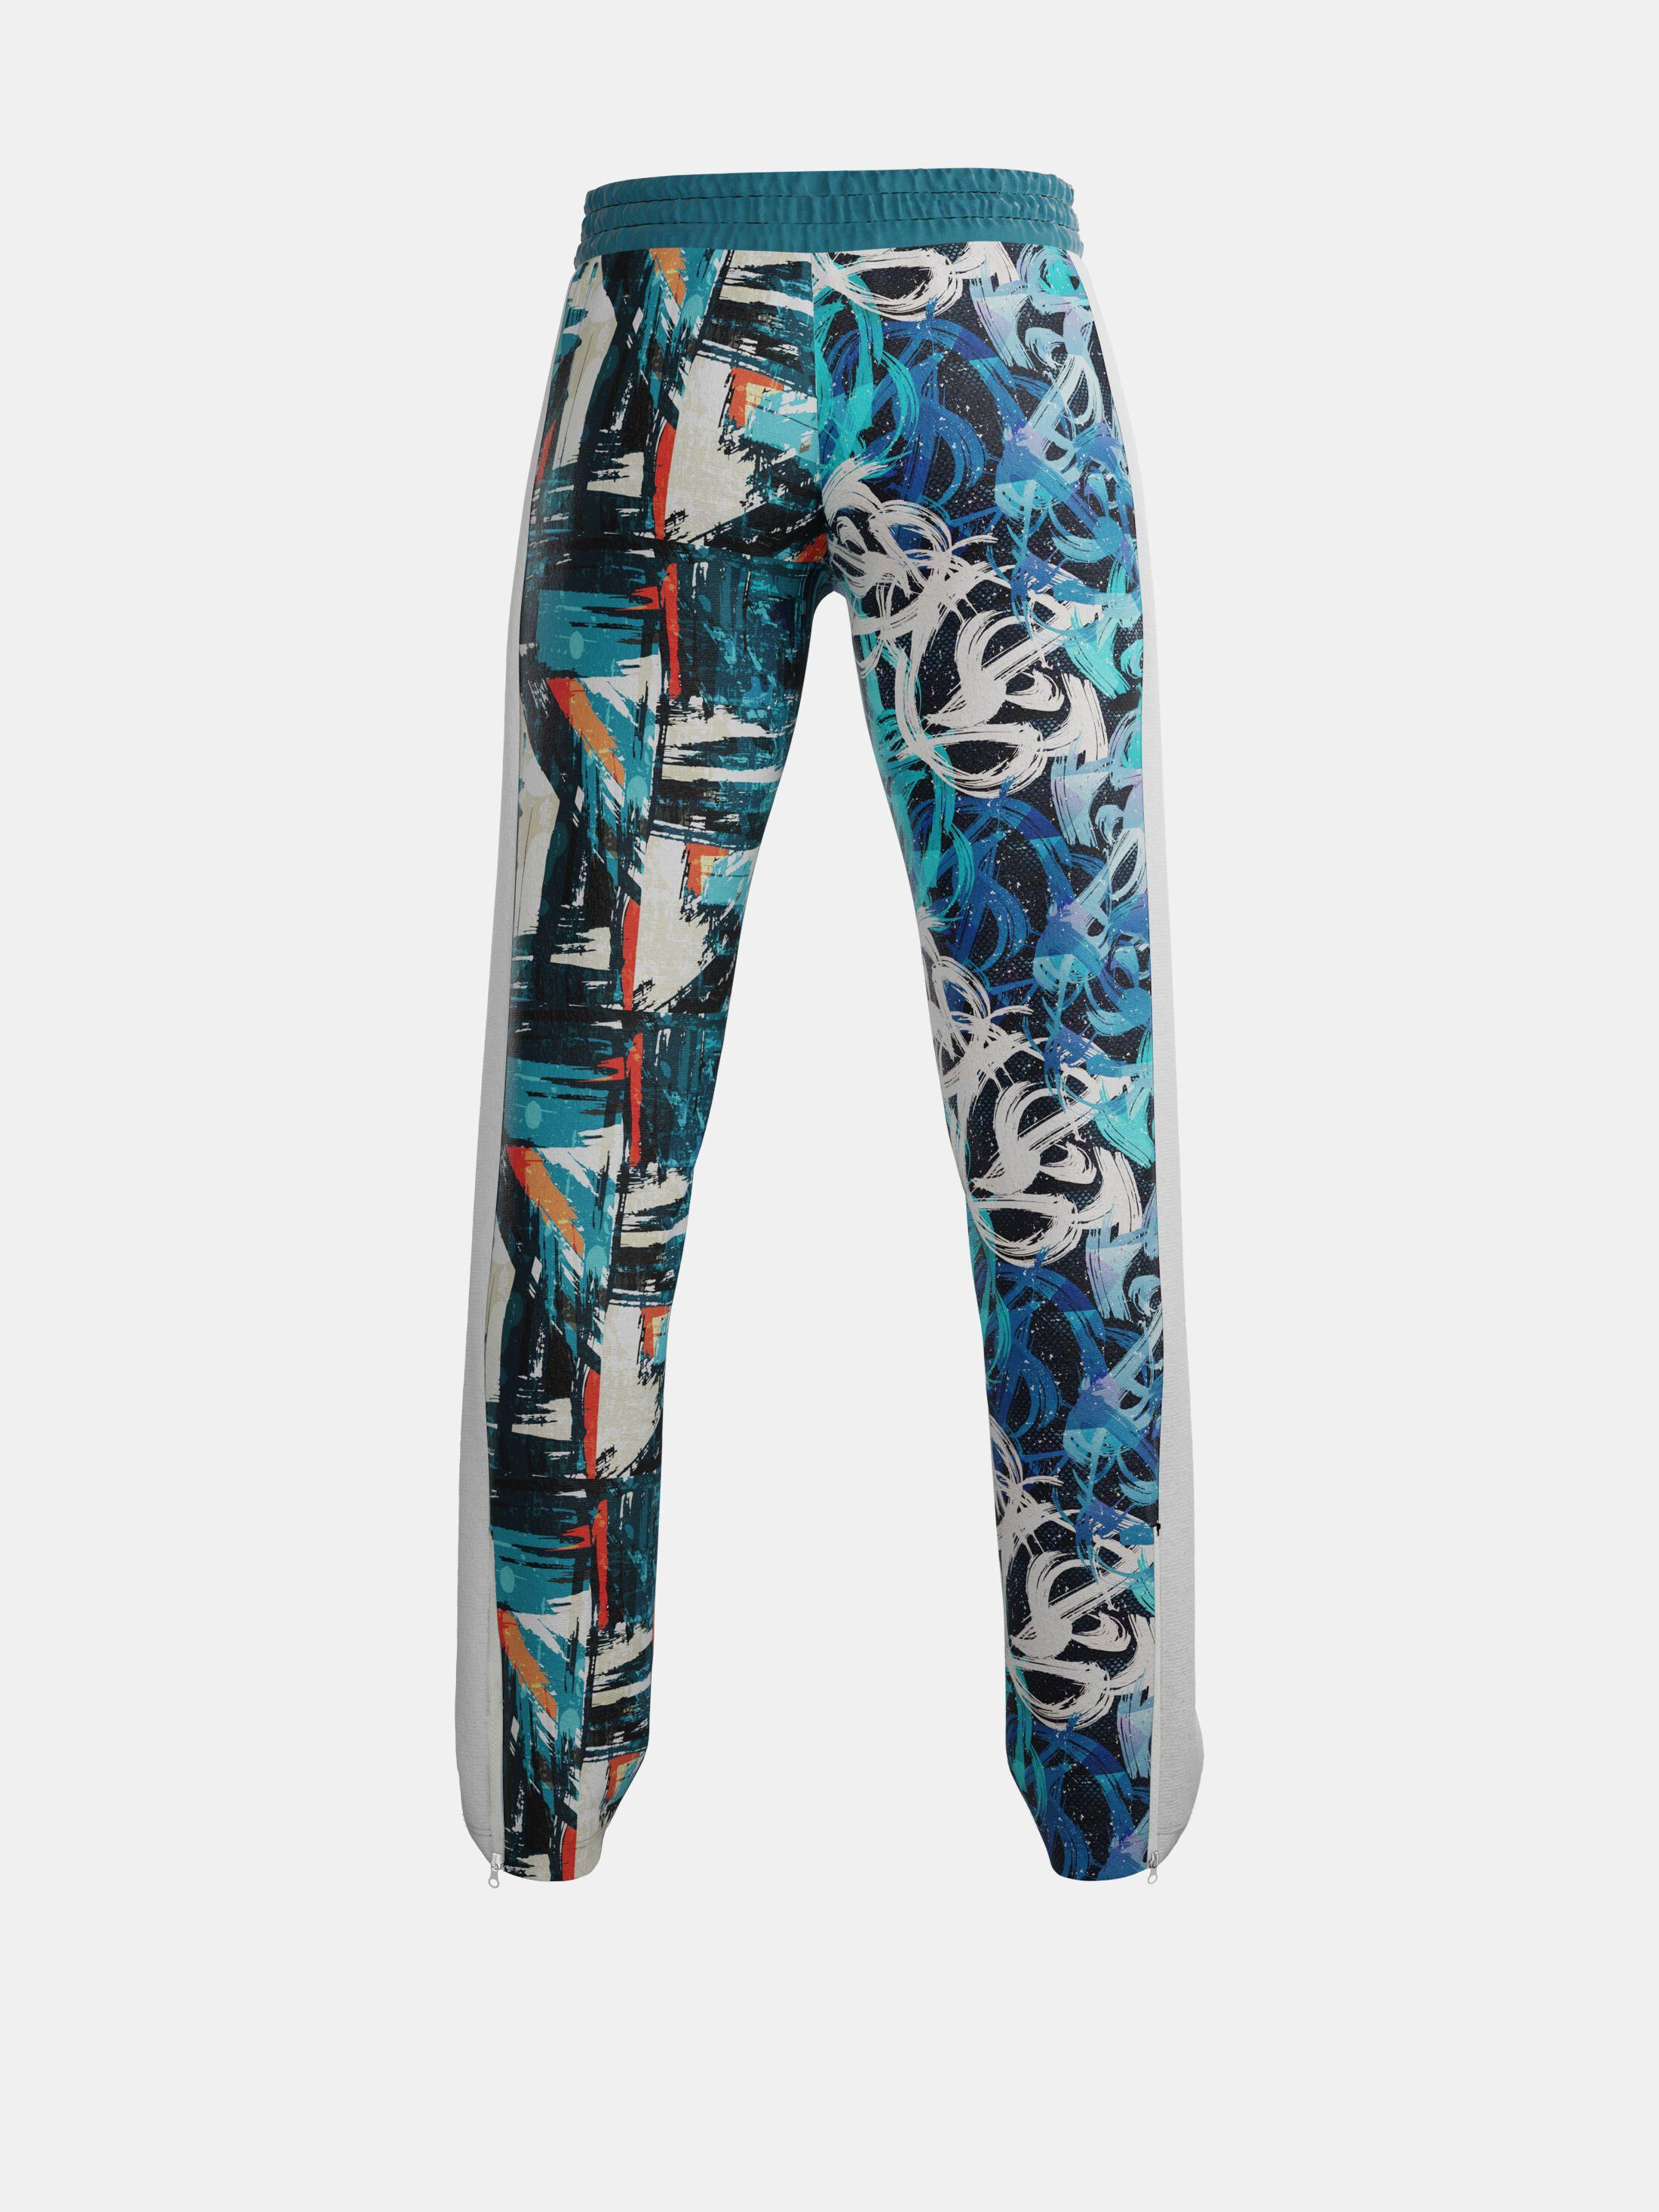 Custom Jogging Jacket & Pants back view